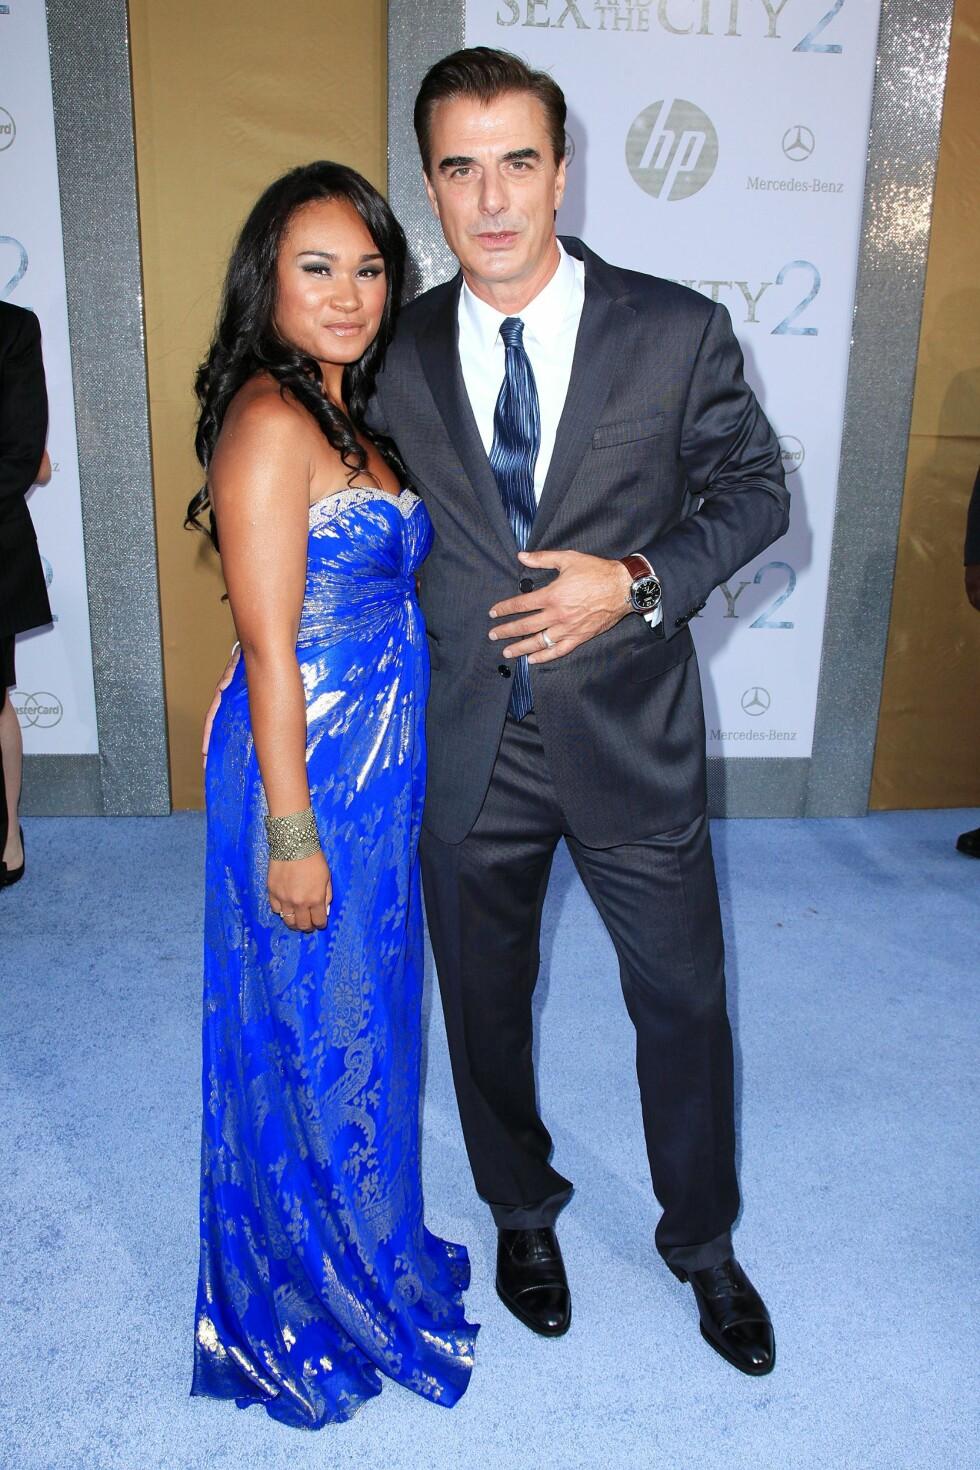 HERR OG FRU: Chris «Mr. Big» Noth er samboer med den 28 år yngre skuespilleren Tara Wilson. Her fra premieren på «Sex and the City 2» i 2010. Foto: NTB Scanpix